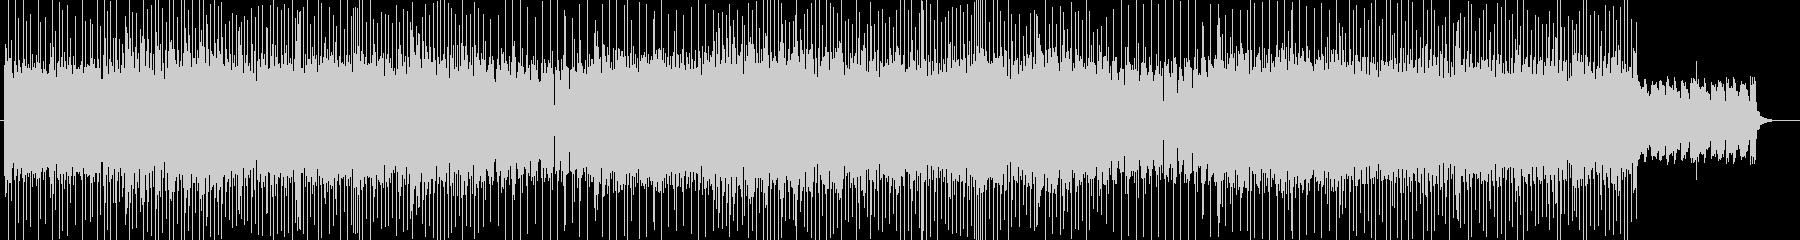 「HR/HM」「POWER」BGM275の未再生の波形